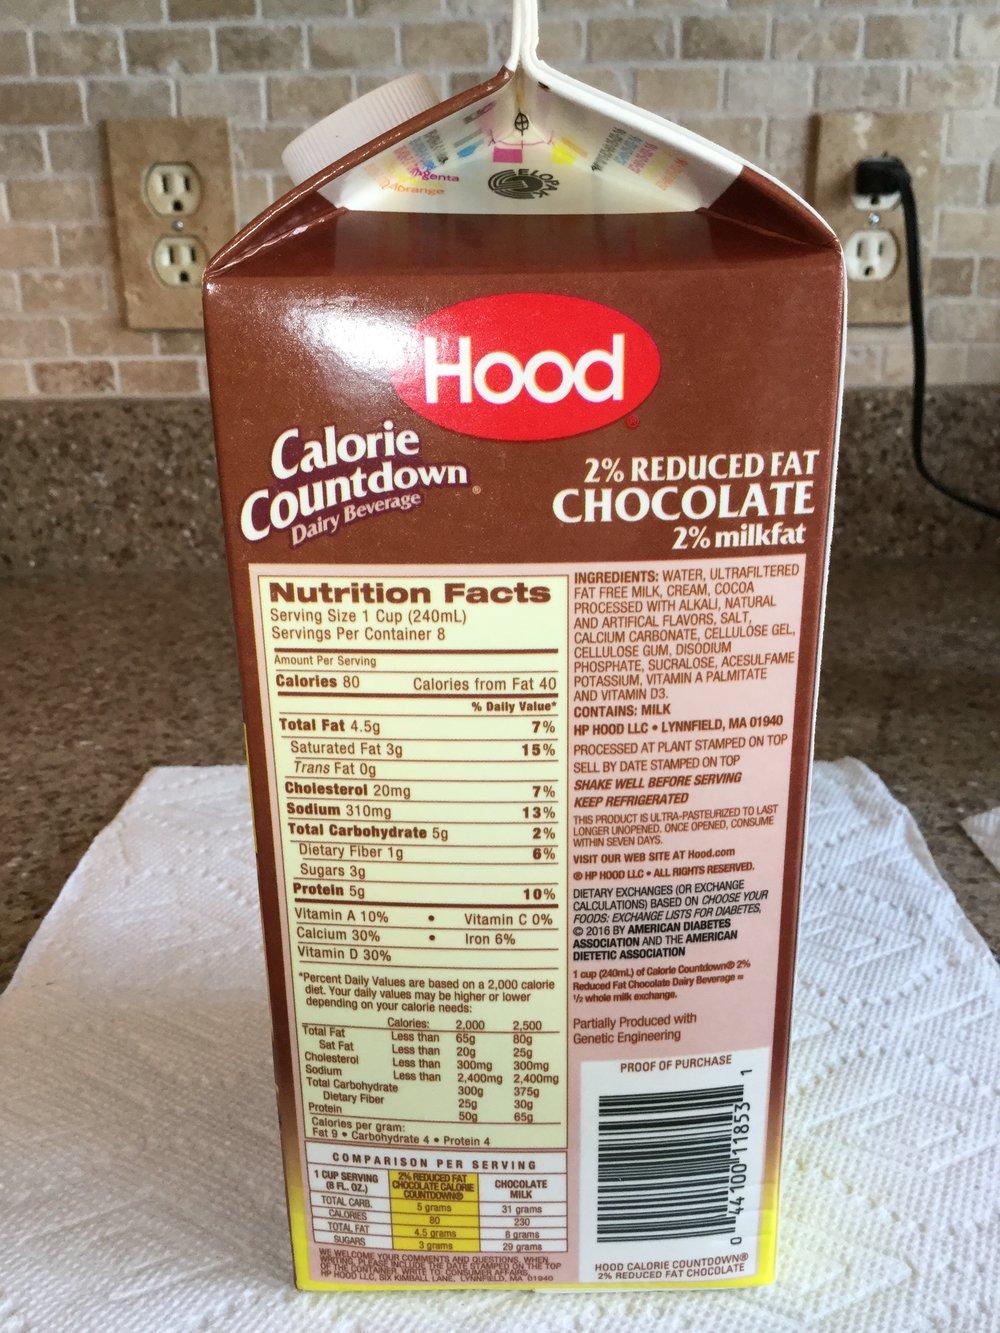 Hood Calorie Countdown 2% Chocolate Dairy Beverage Side 1